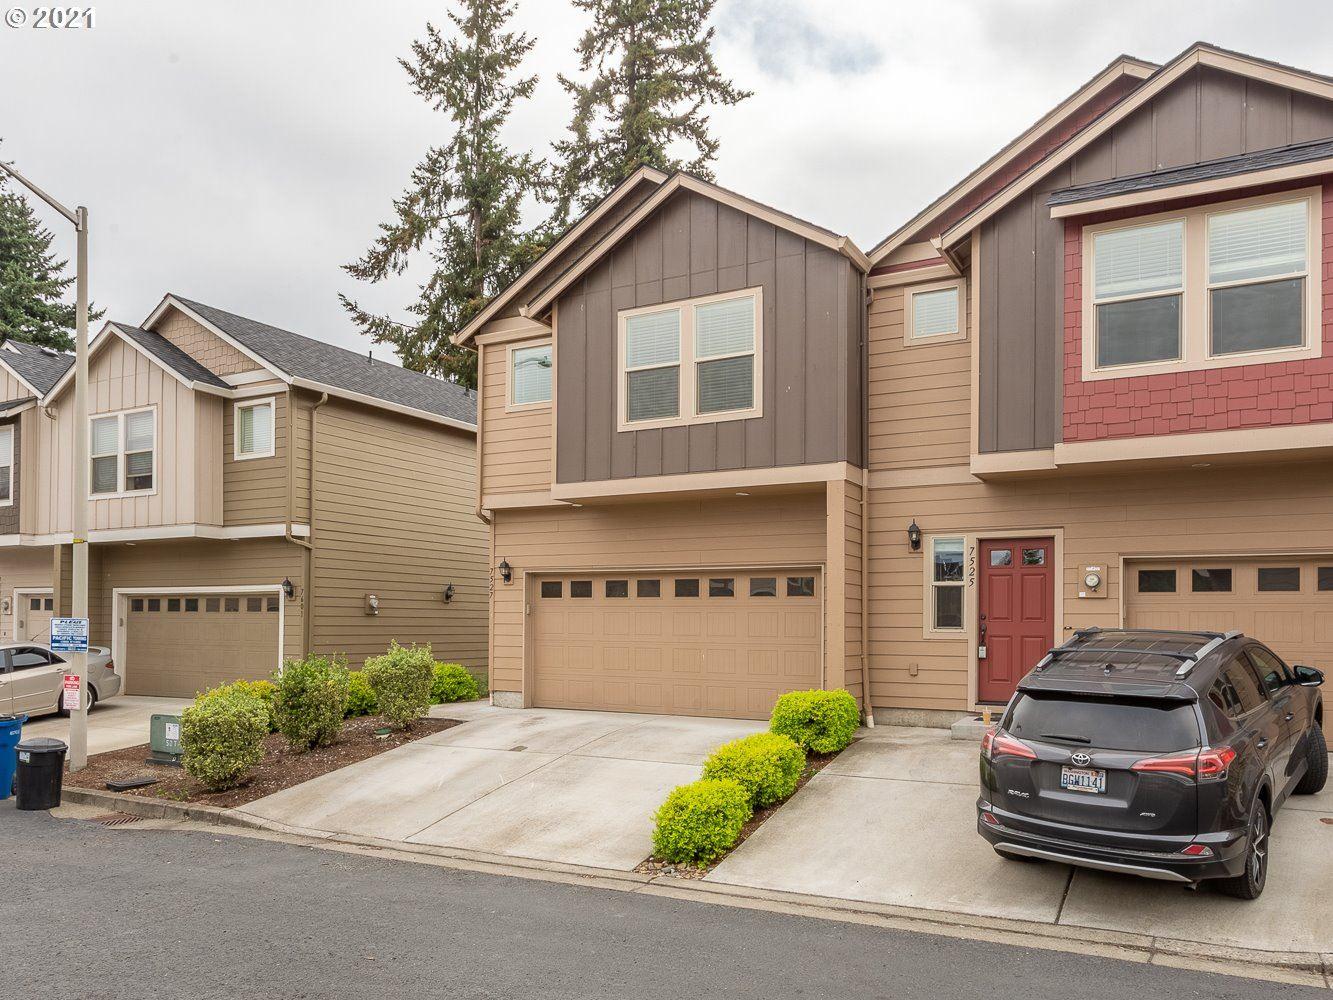 7527 NE 99TH AVE, Vancouver, WA 98662 - MLS#: 21207062